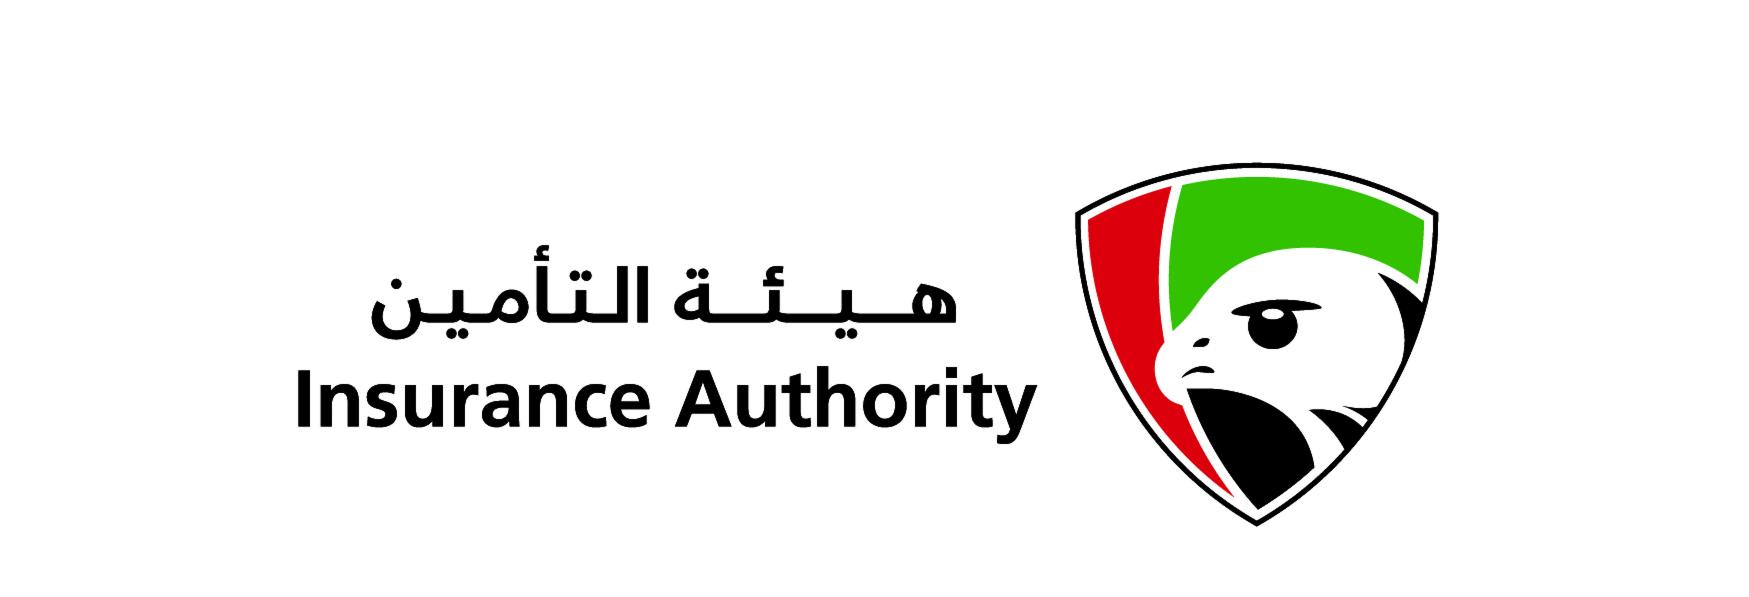 Insurance Authority